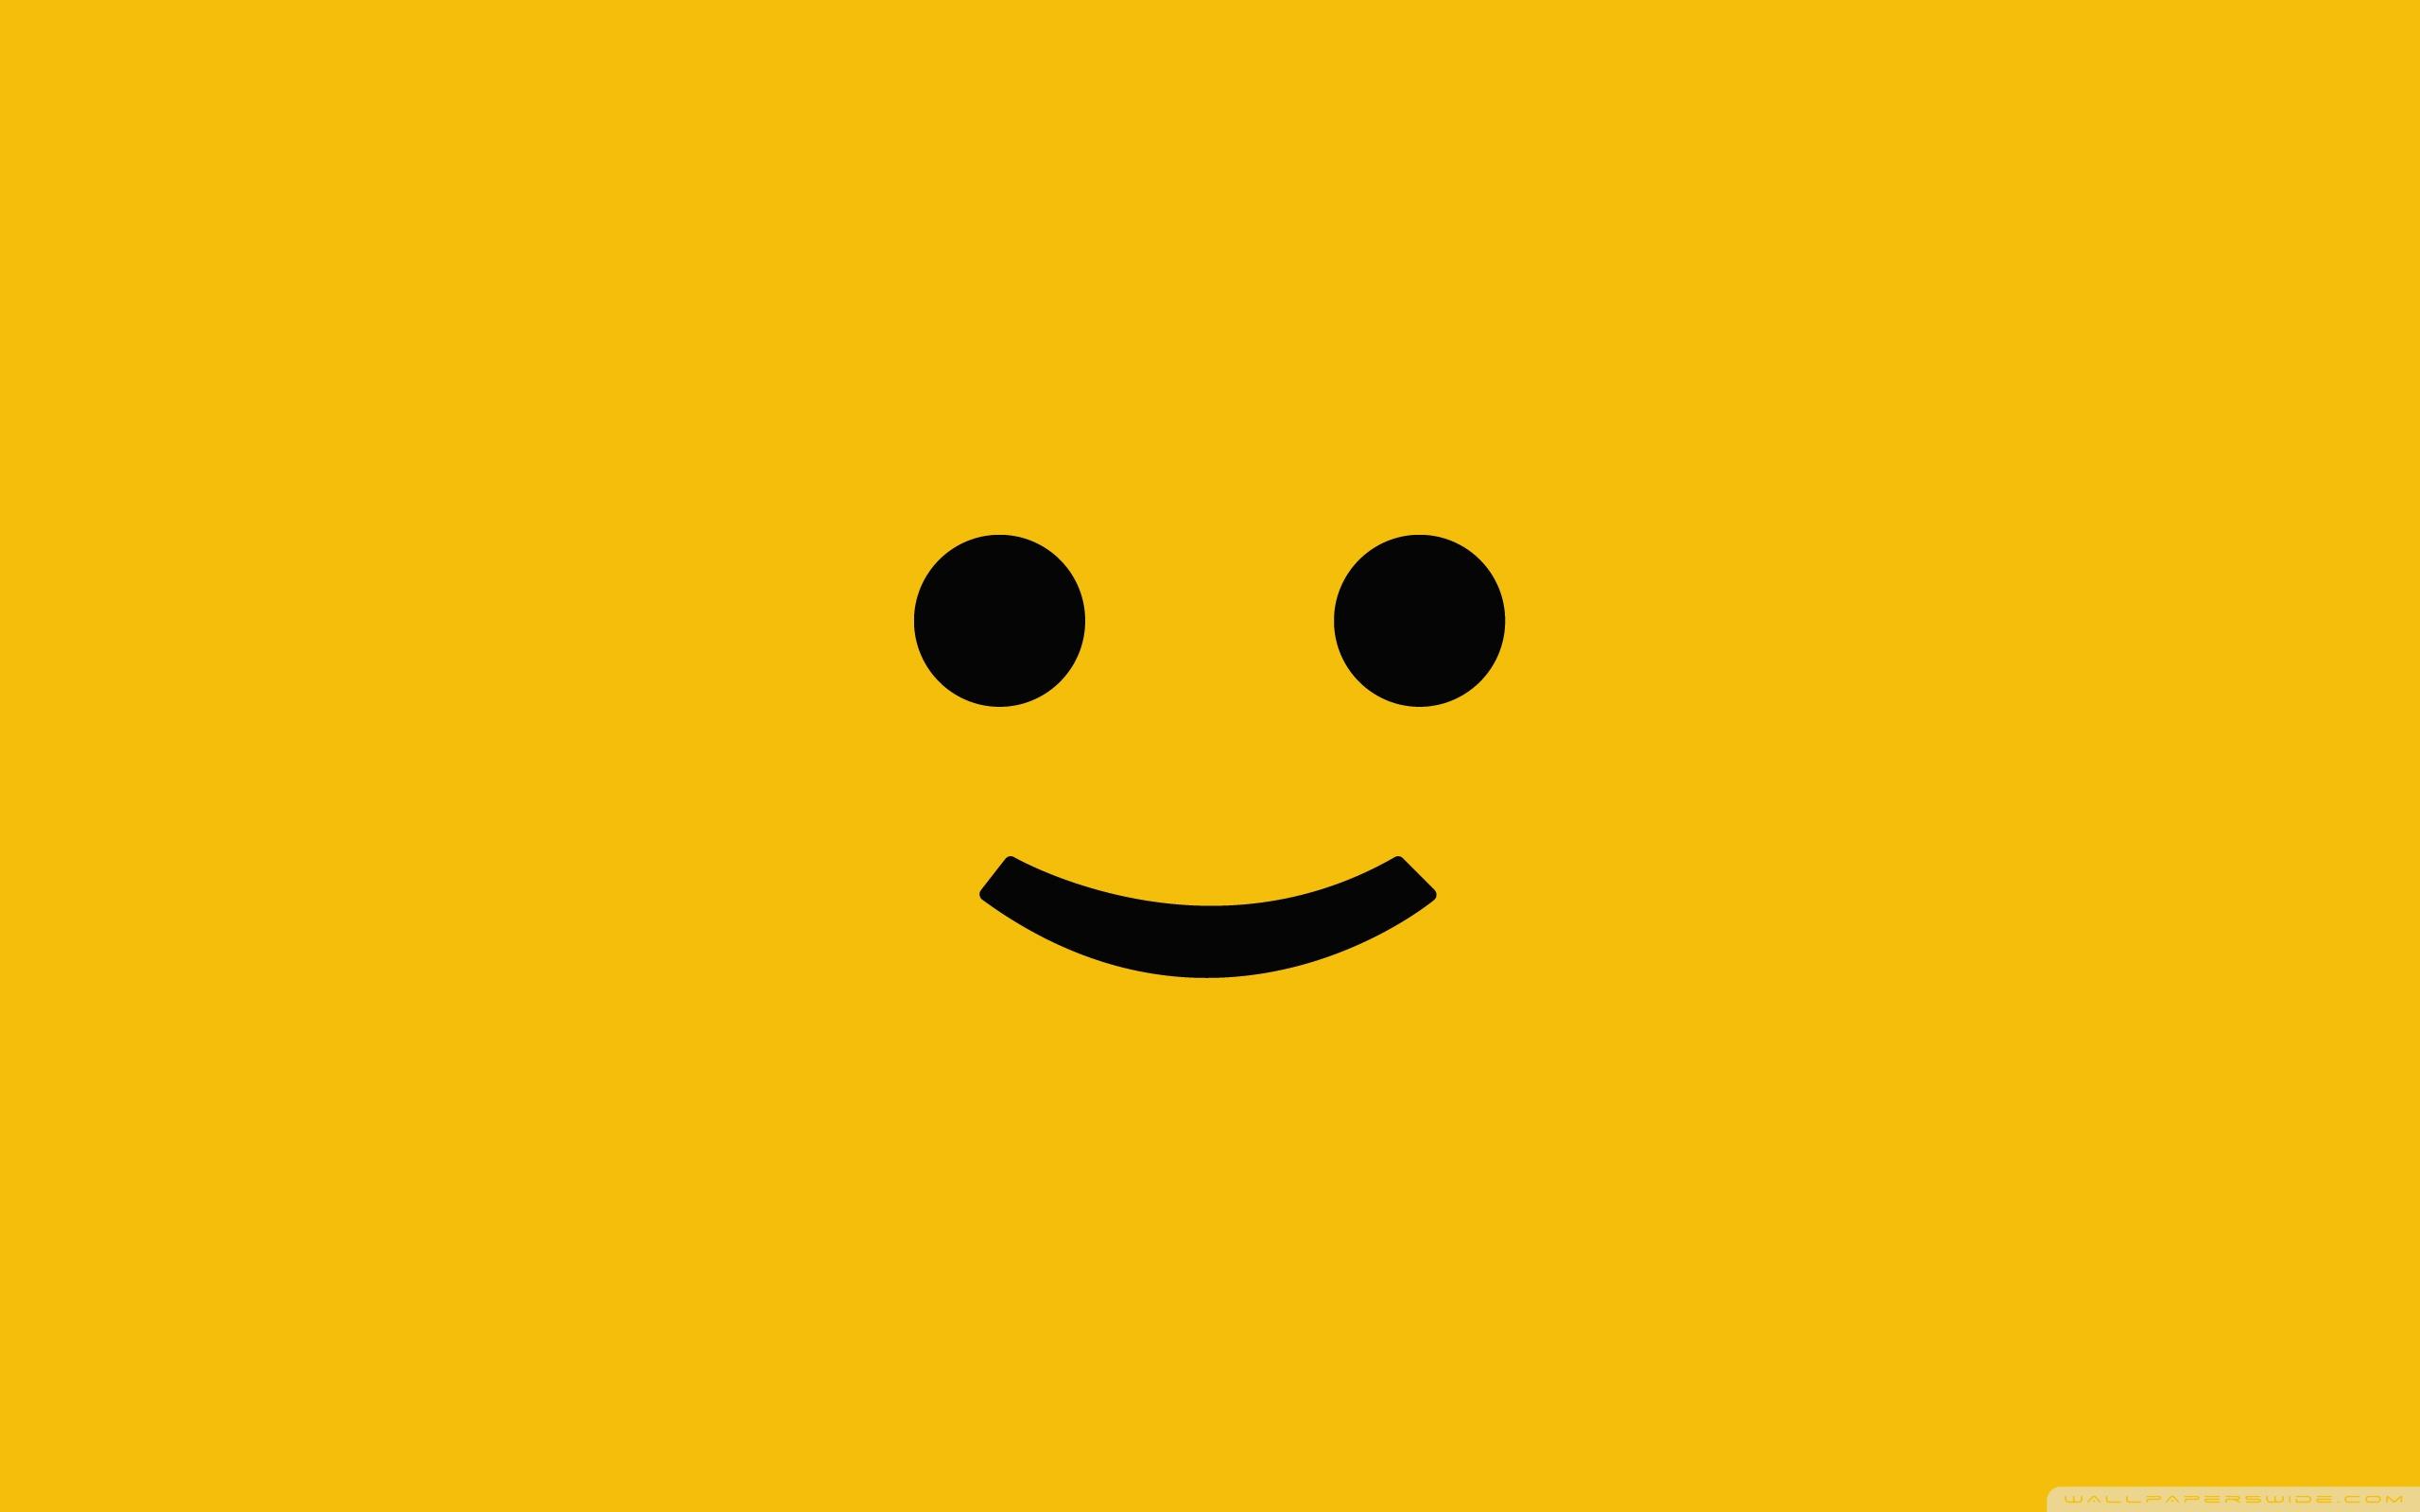 Smiley Wallpaper (2)